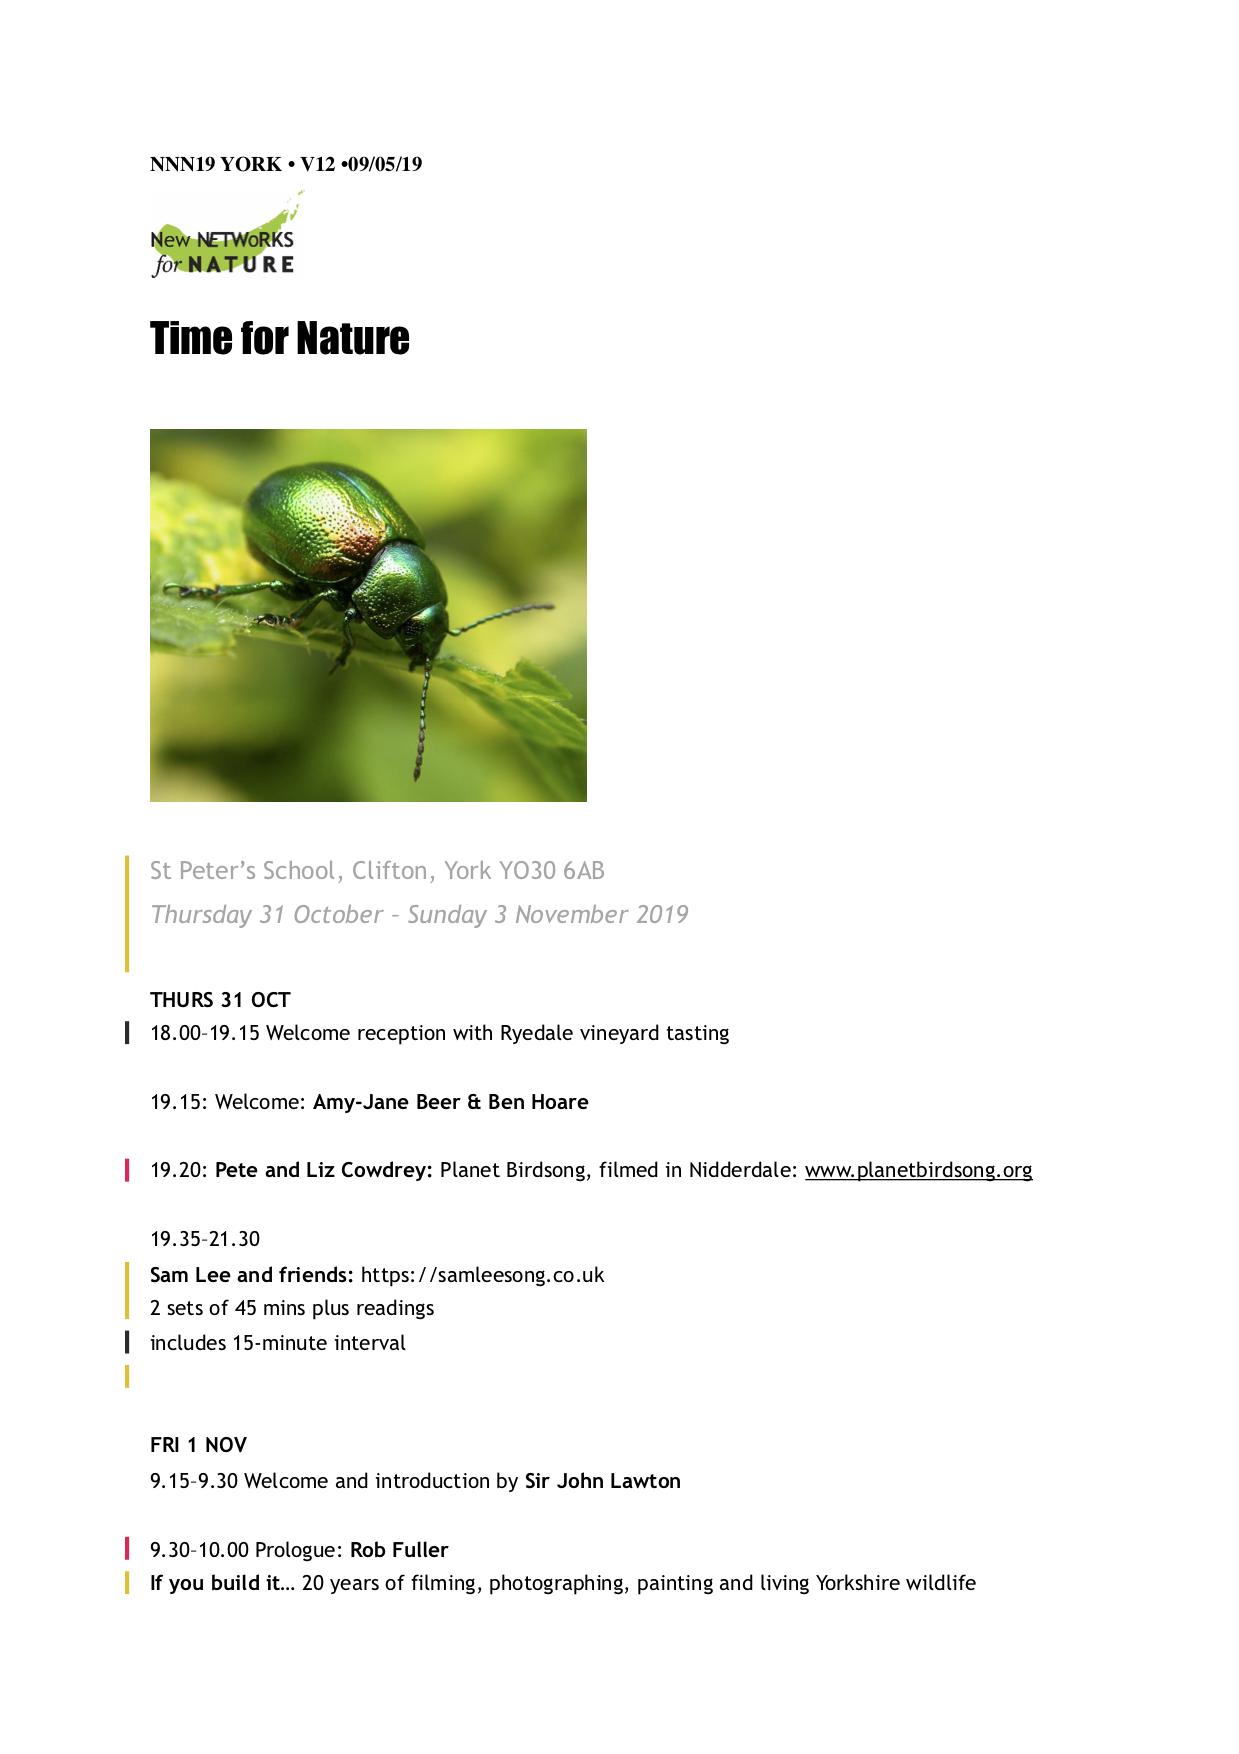 NNN19 programme_Eventbrite and website.jpg